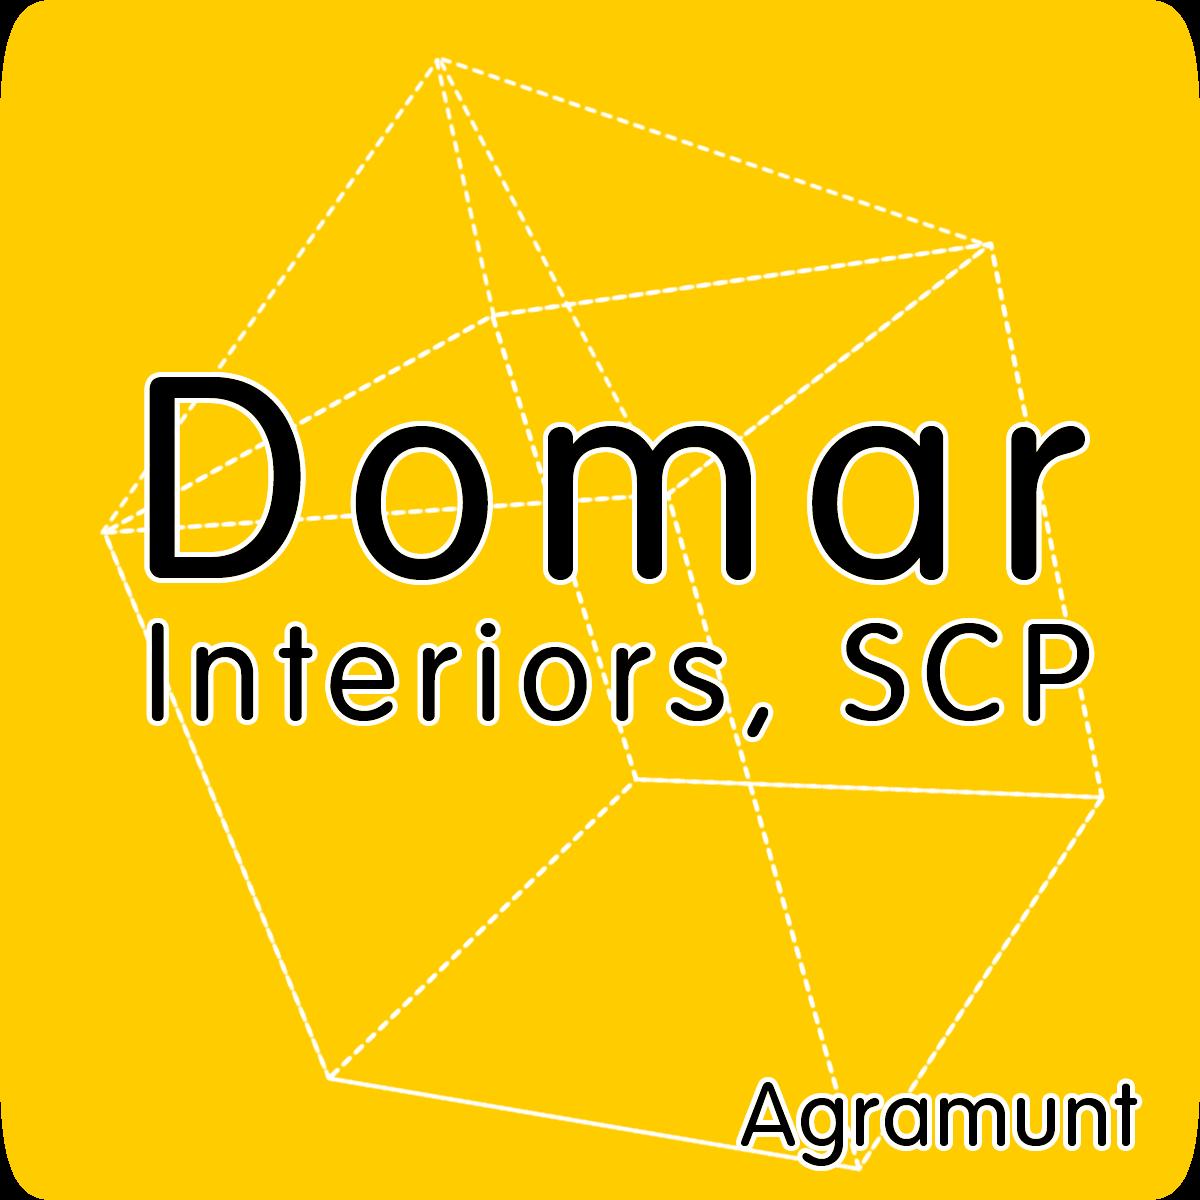 Domar Interiors, Scp